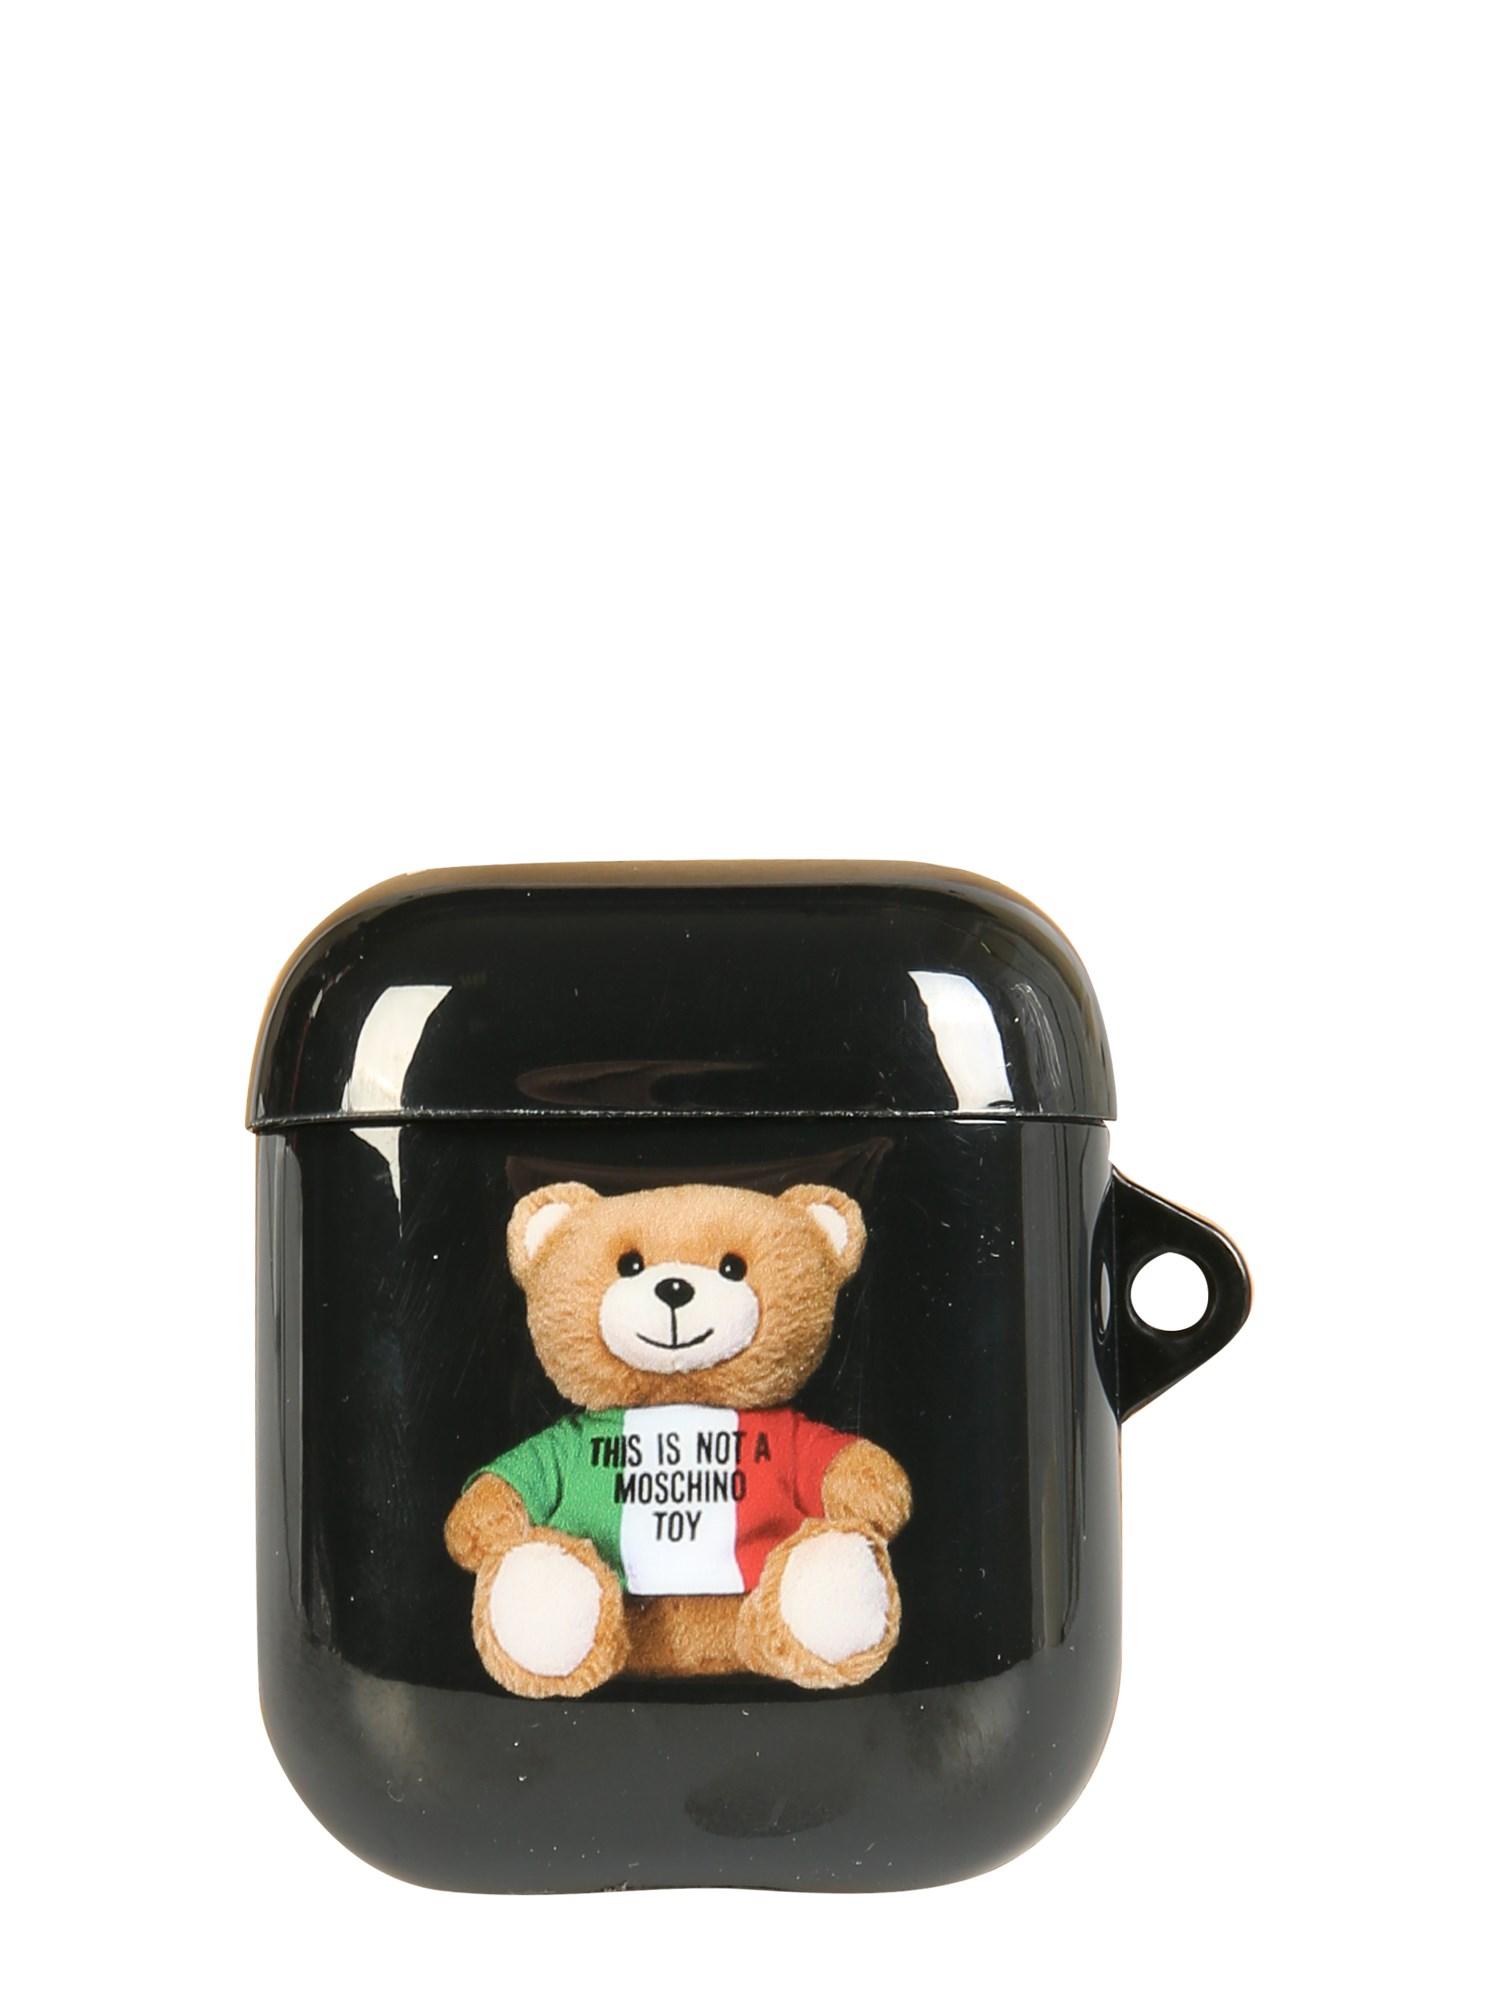 moschino italian teddy bear airpods holder